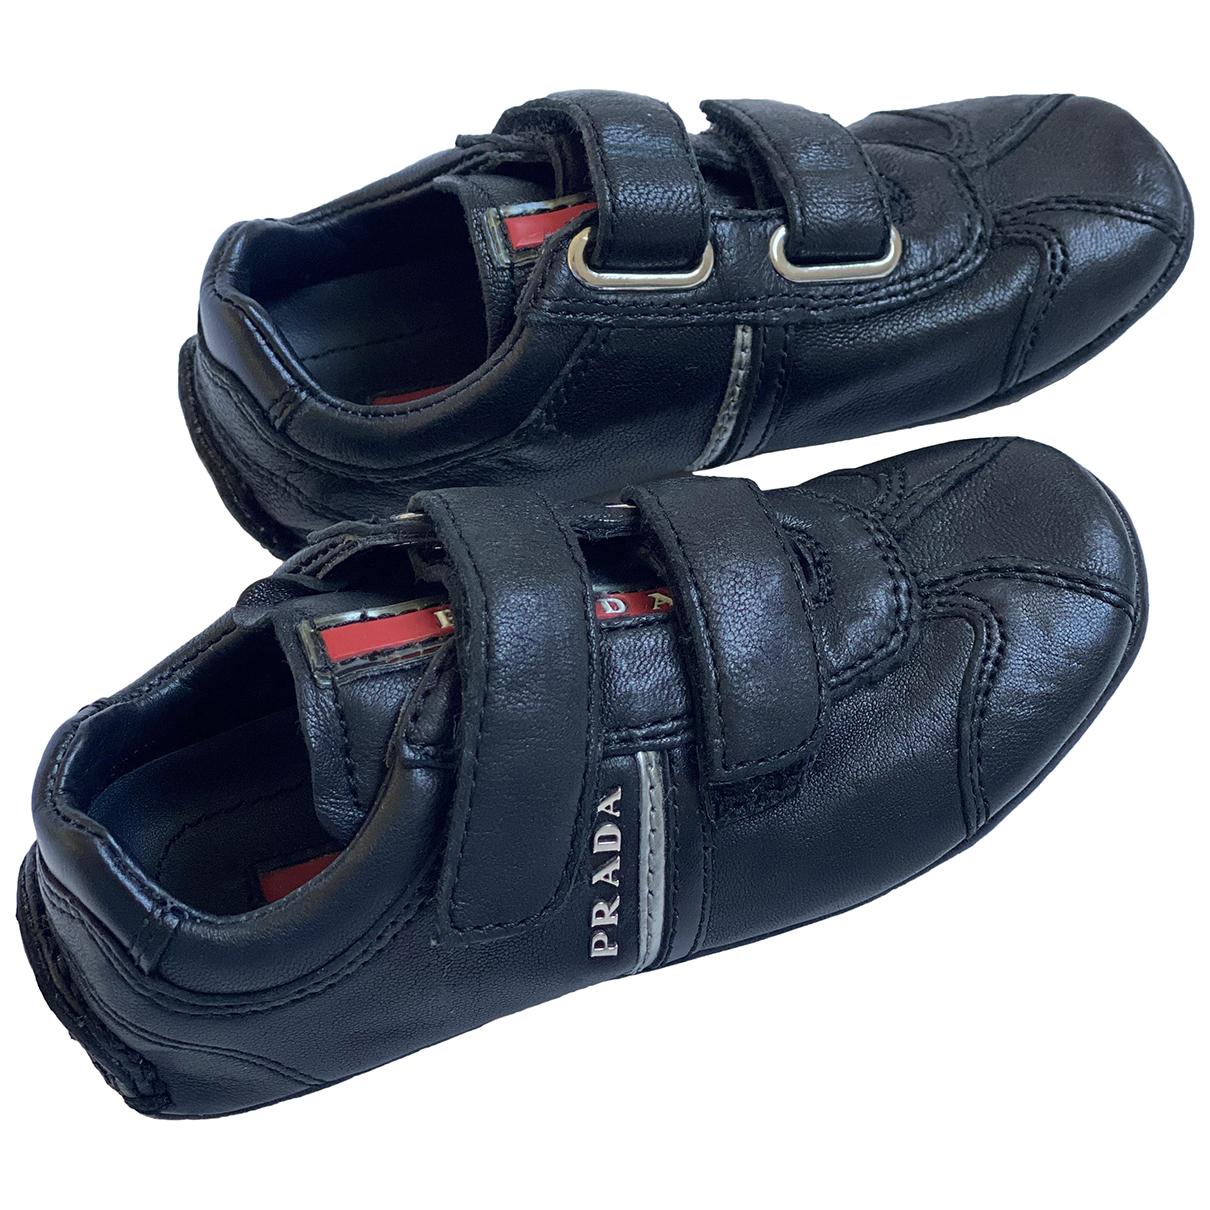 Prada N Black Leather Trainers for Kids 23 FR